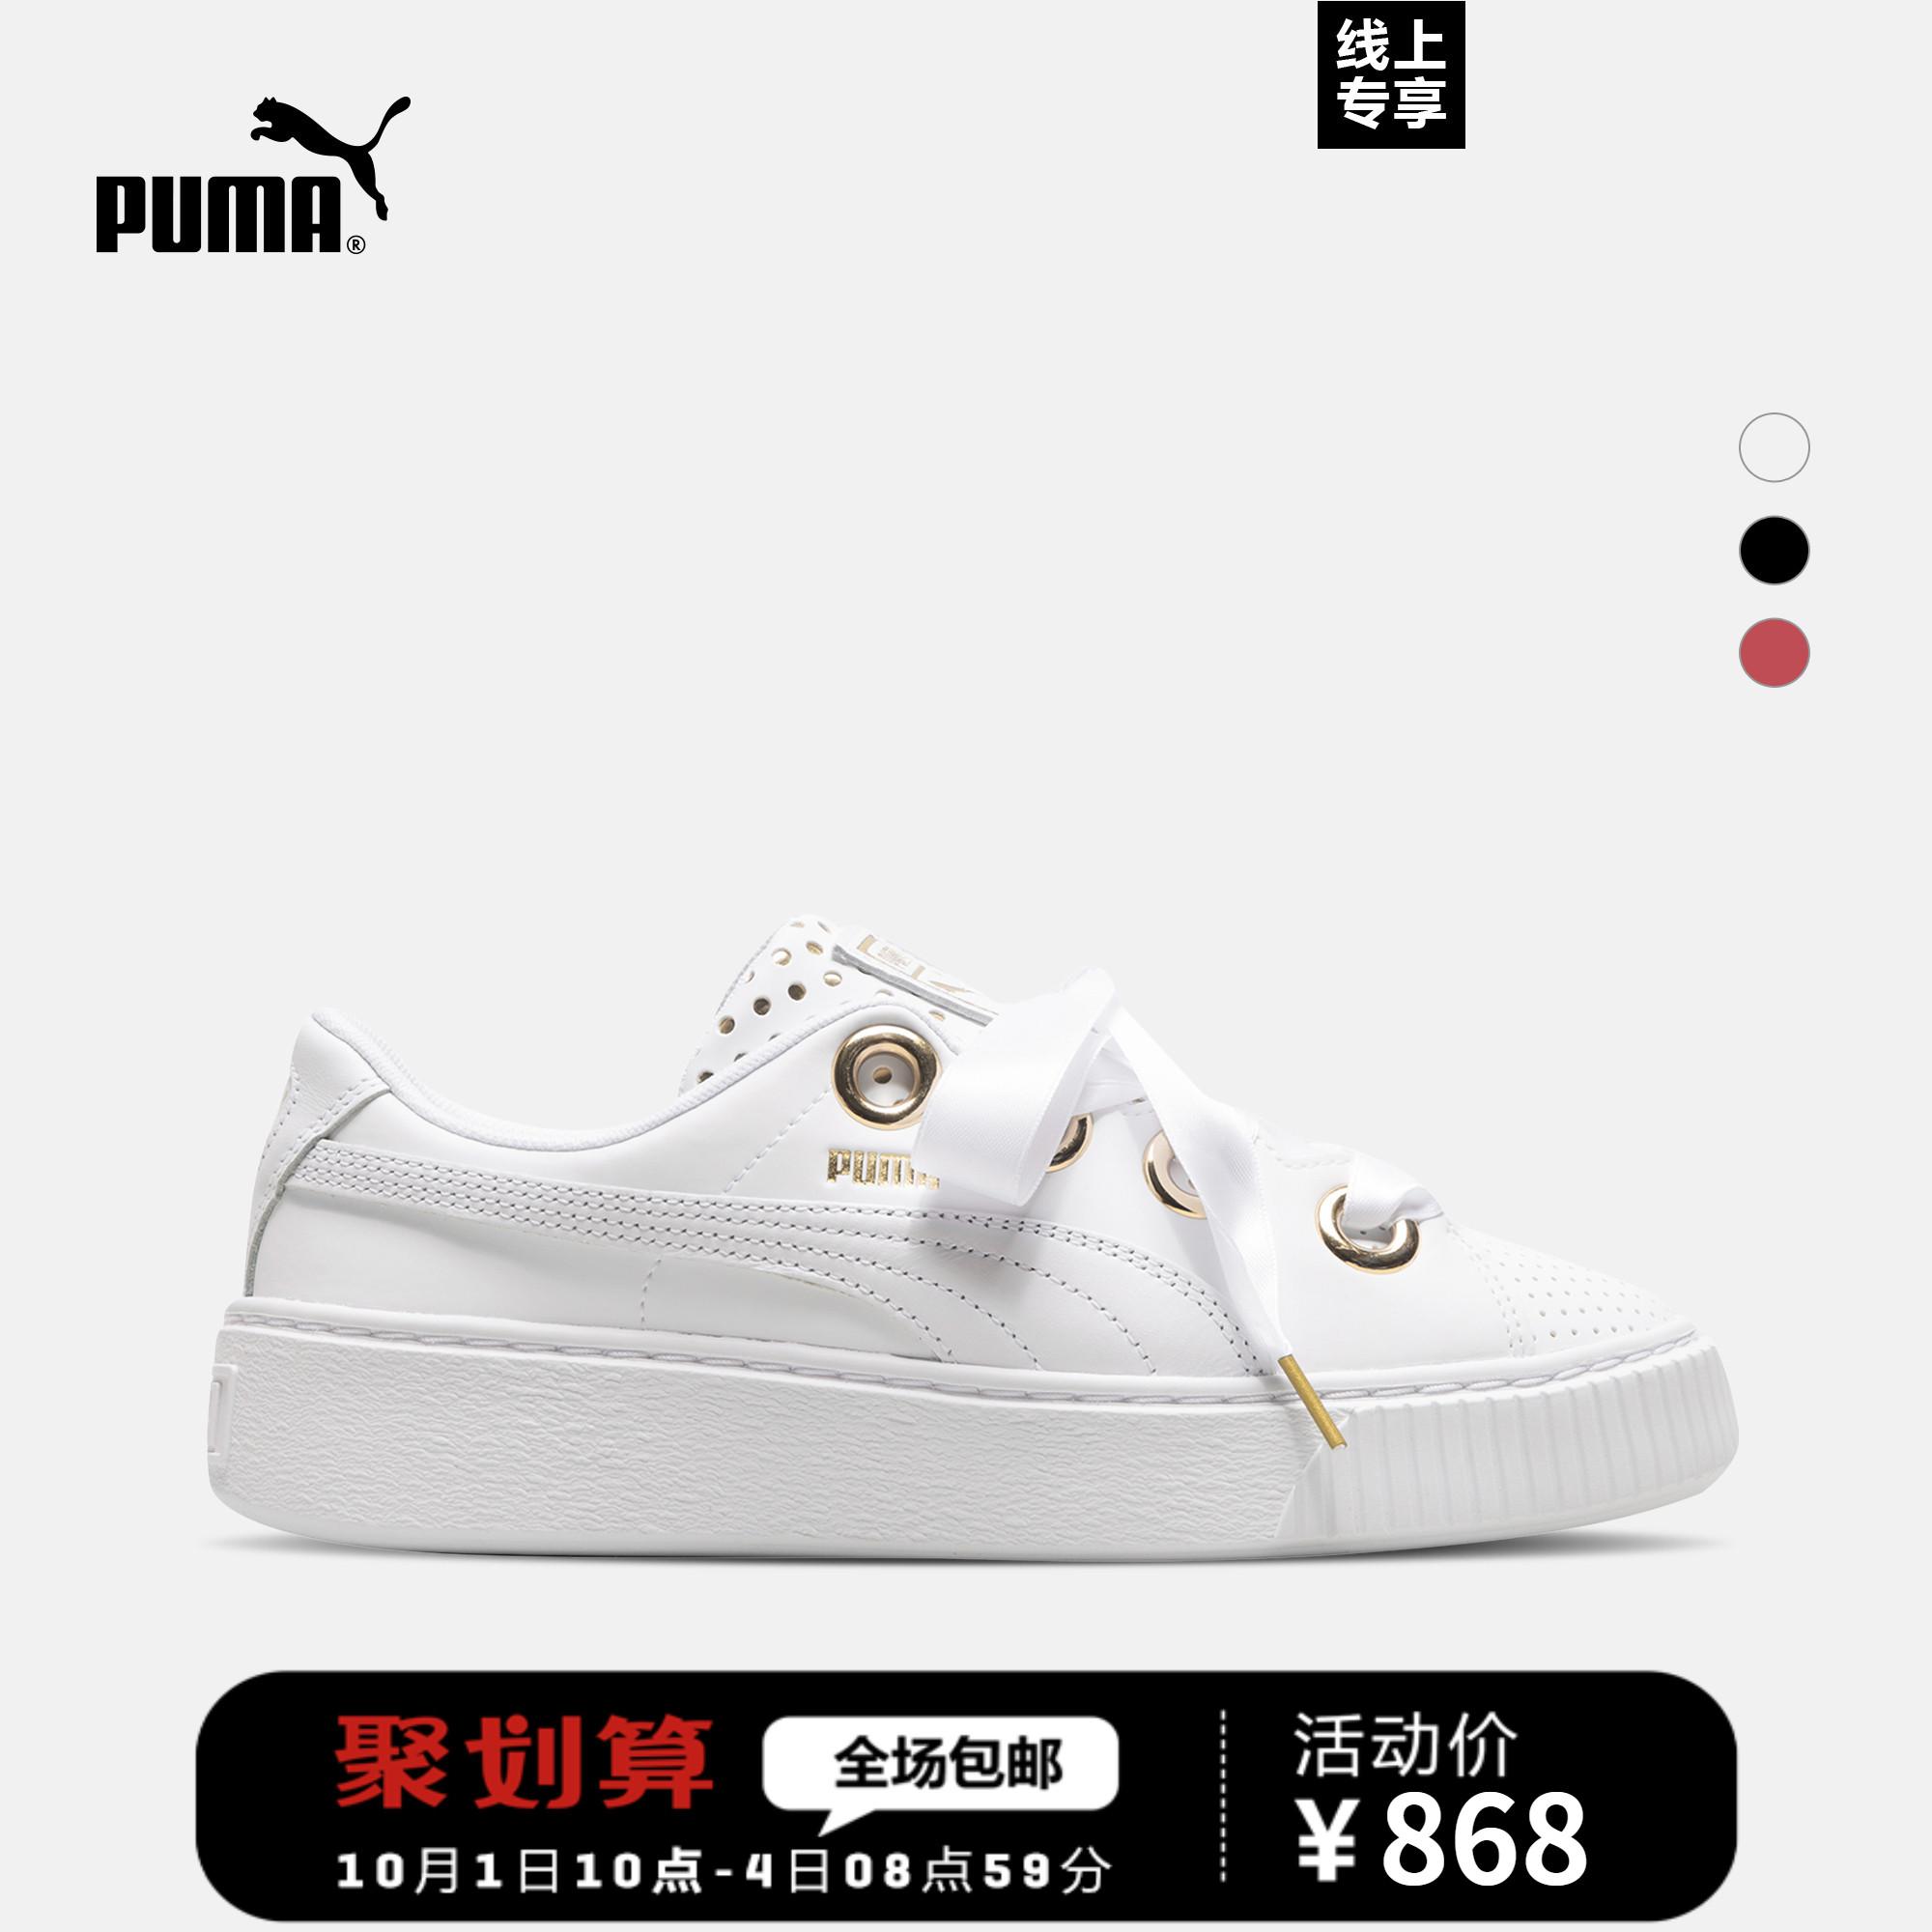 PUMA彪马官方 刘雯同款 女子厚底休闲鞋 Platform Kiss 366704